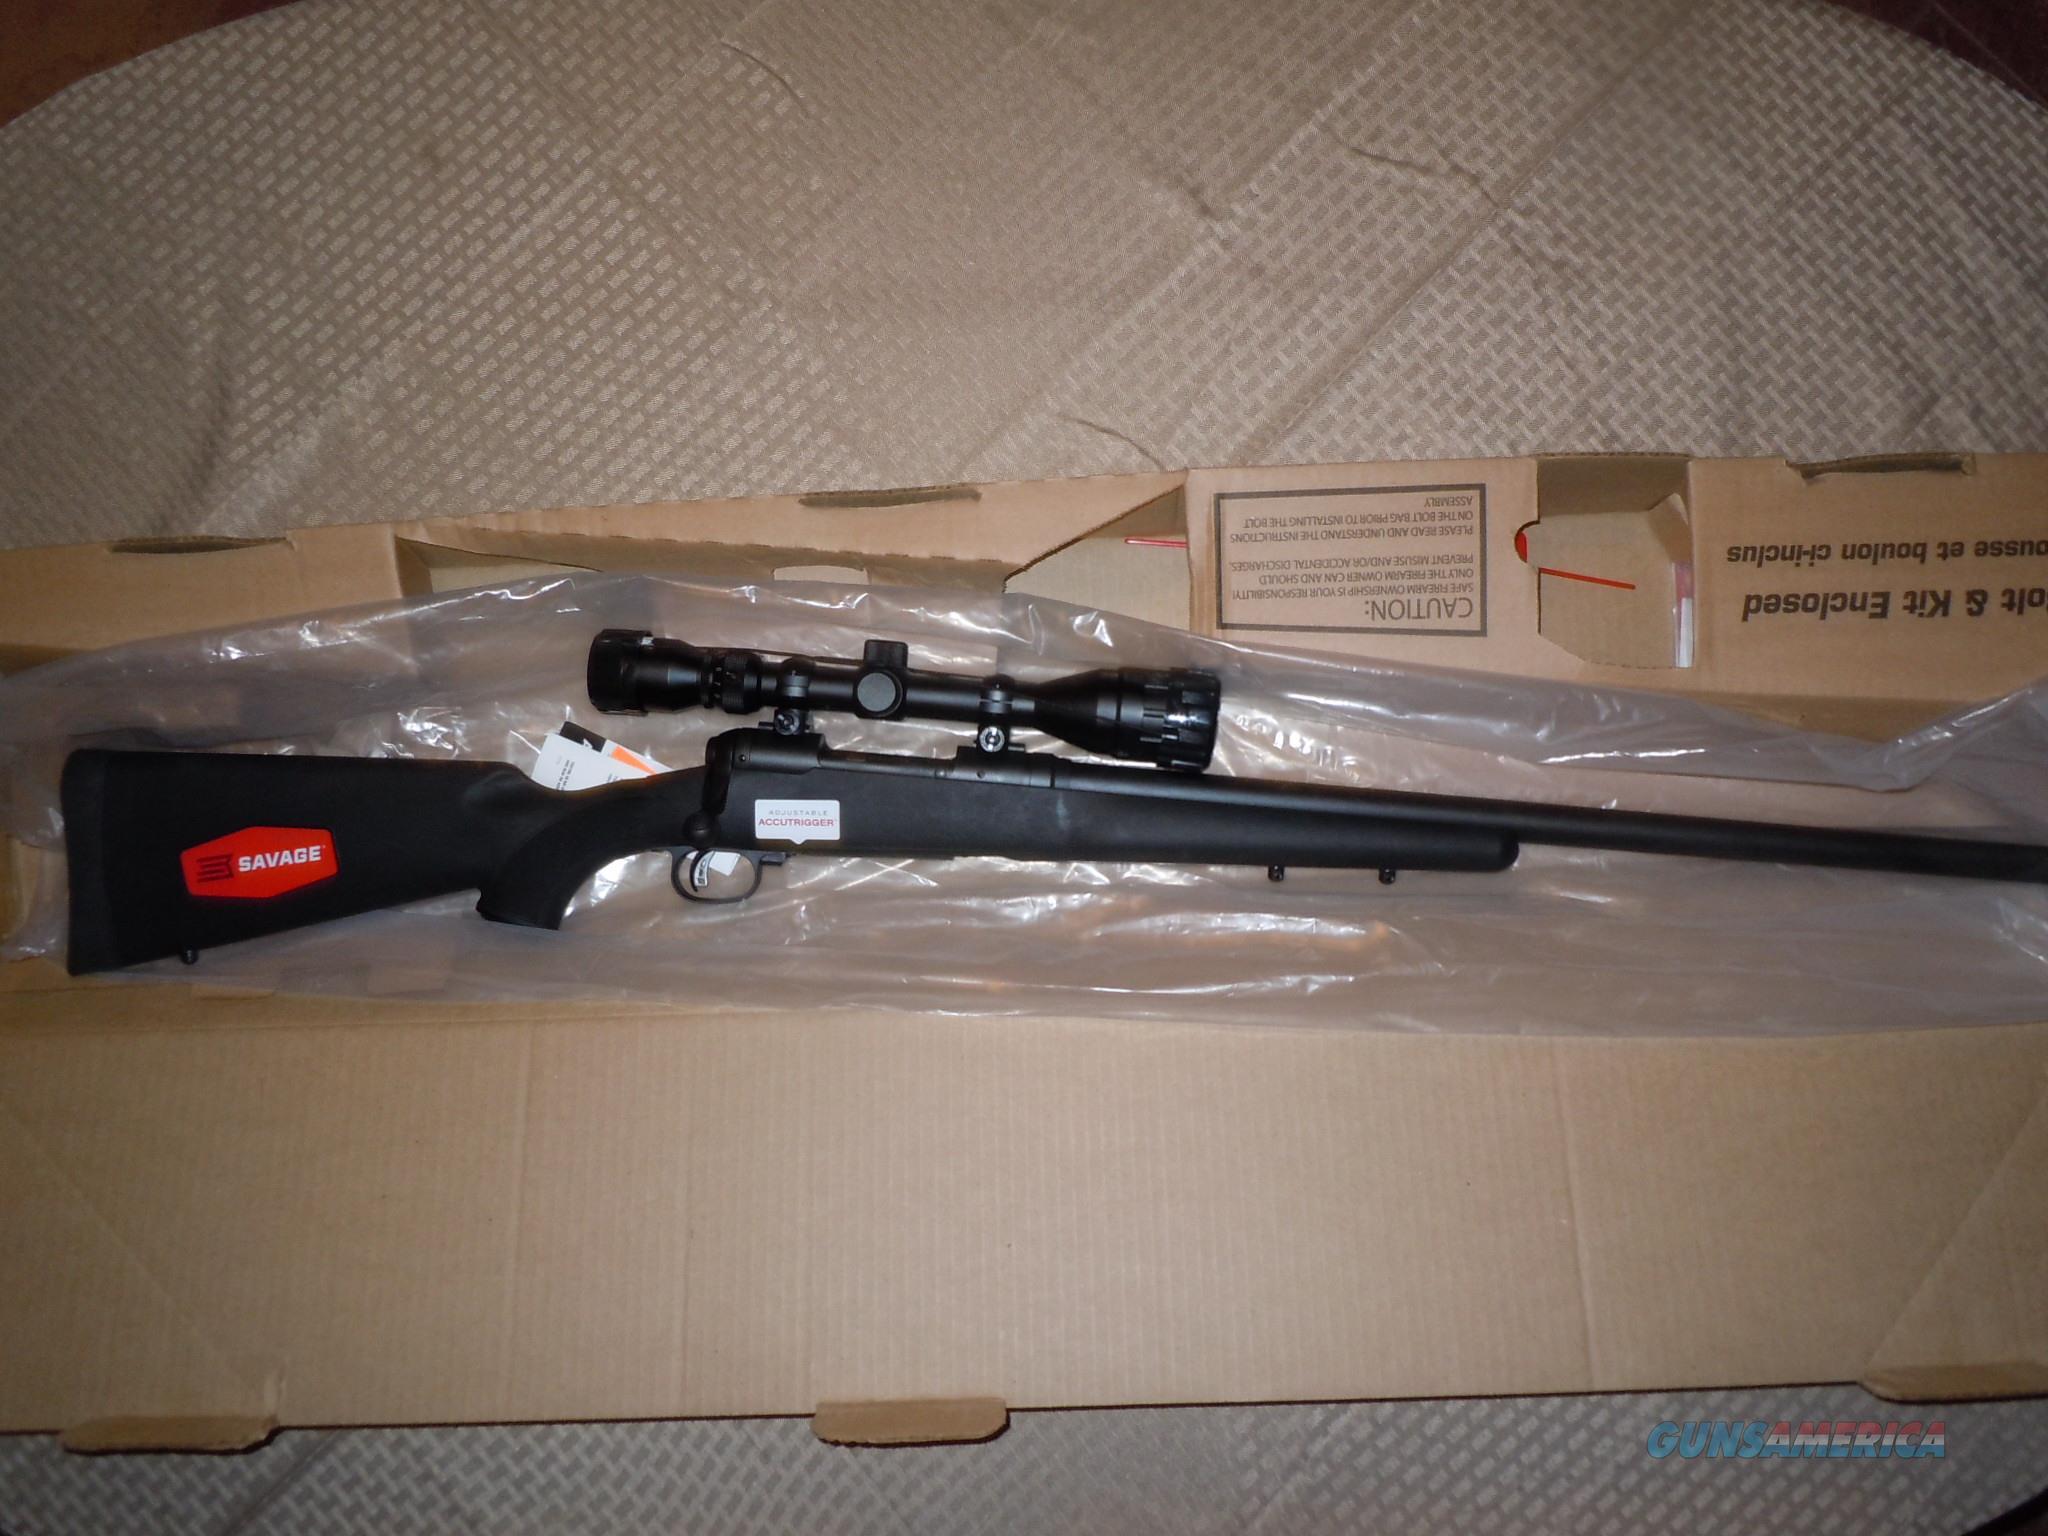 Savage Arms Model 11 V/T 308 Win Heavy Barrel - NIB - $410 SEXY  Guns > Rifles > Savage Rifles > Standard Bolt Action > Sporting